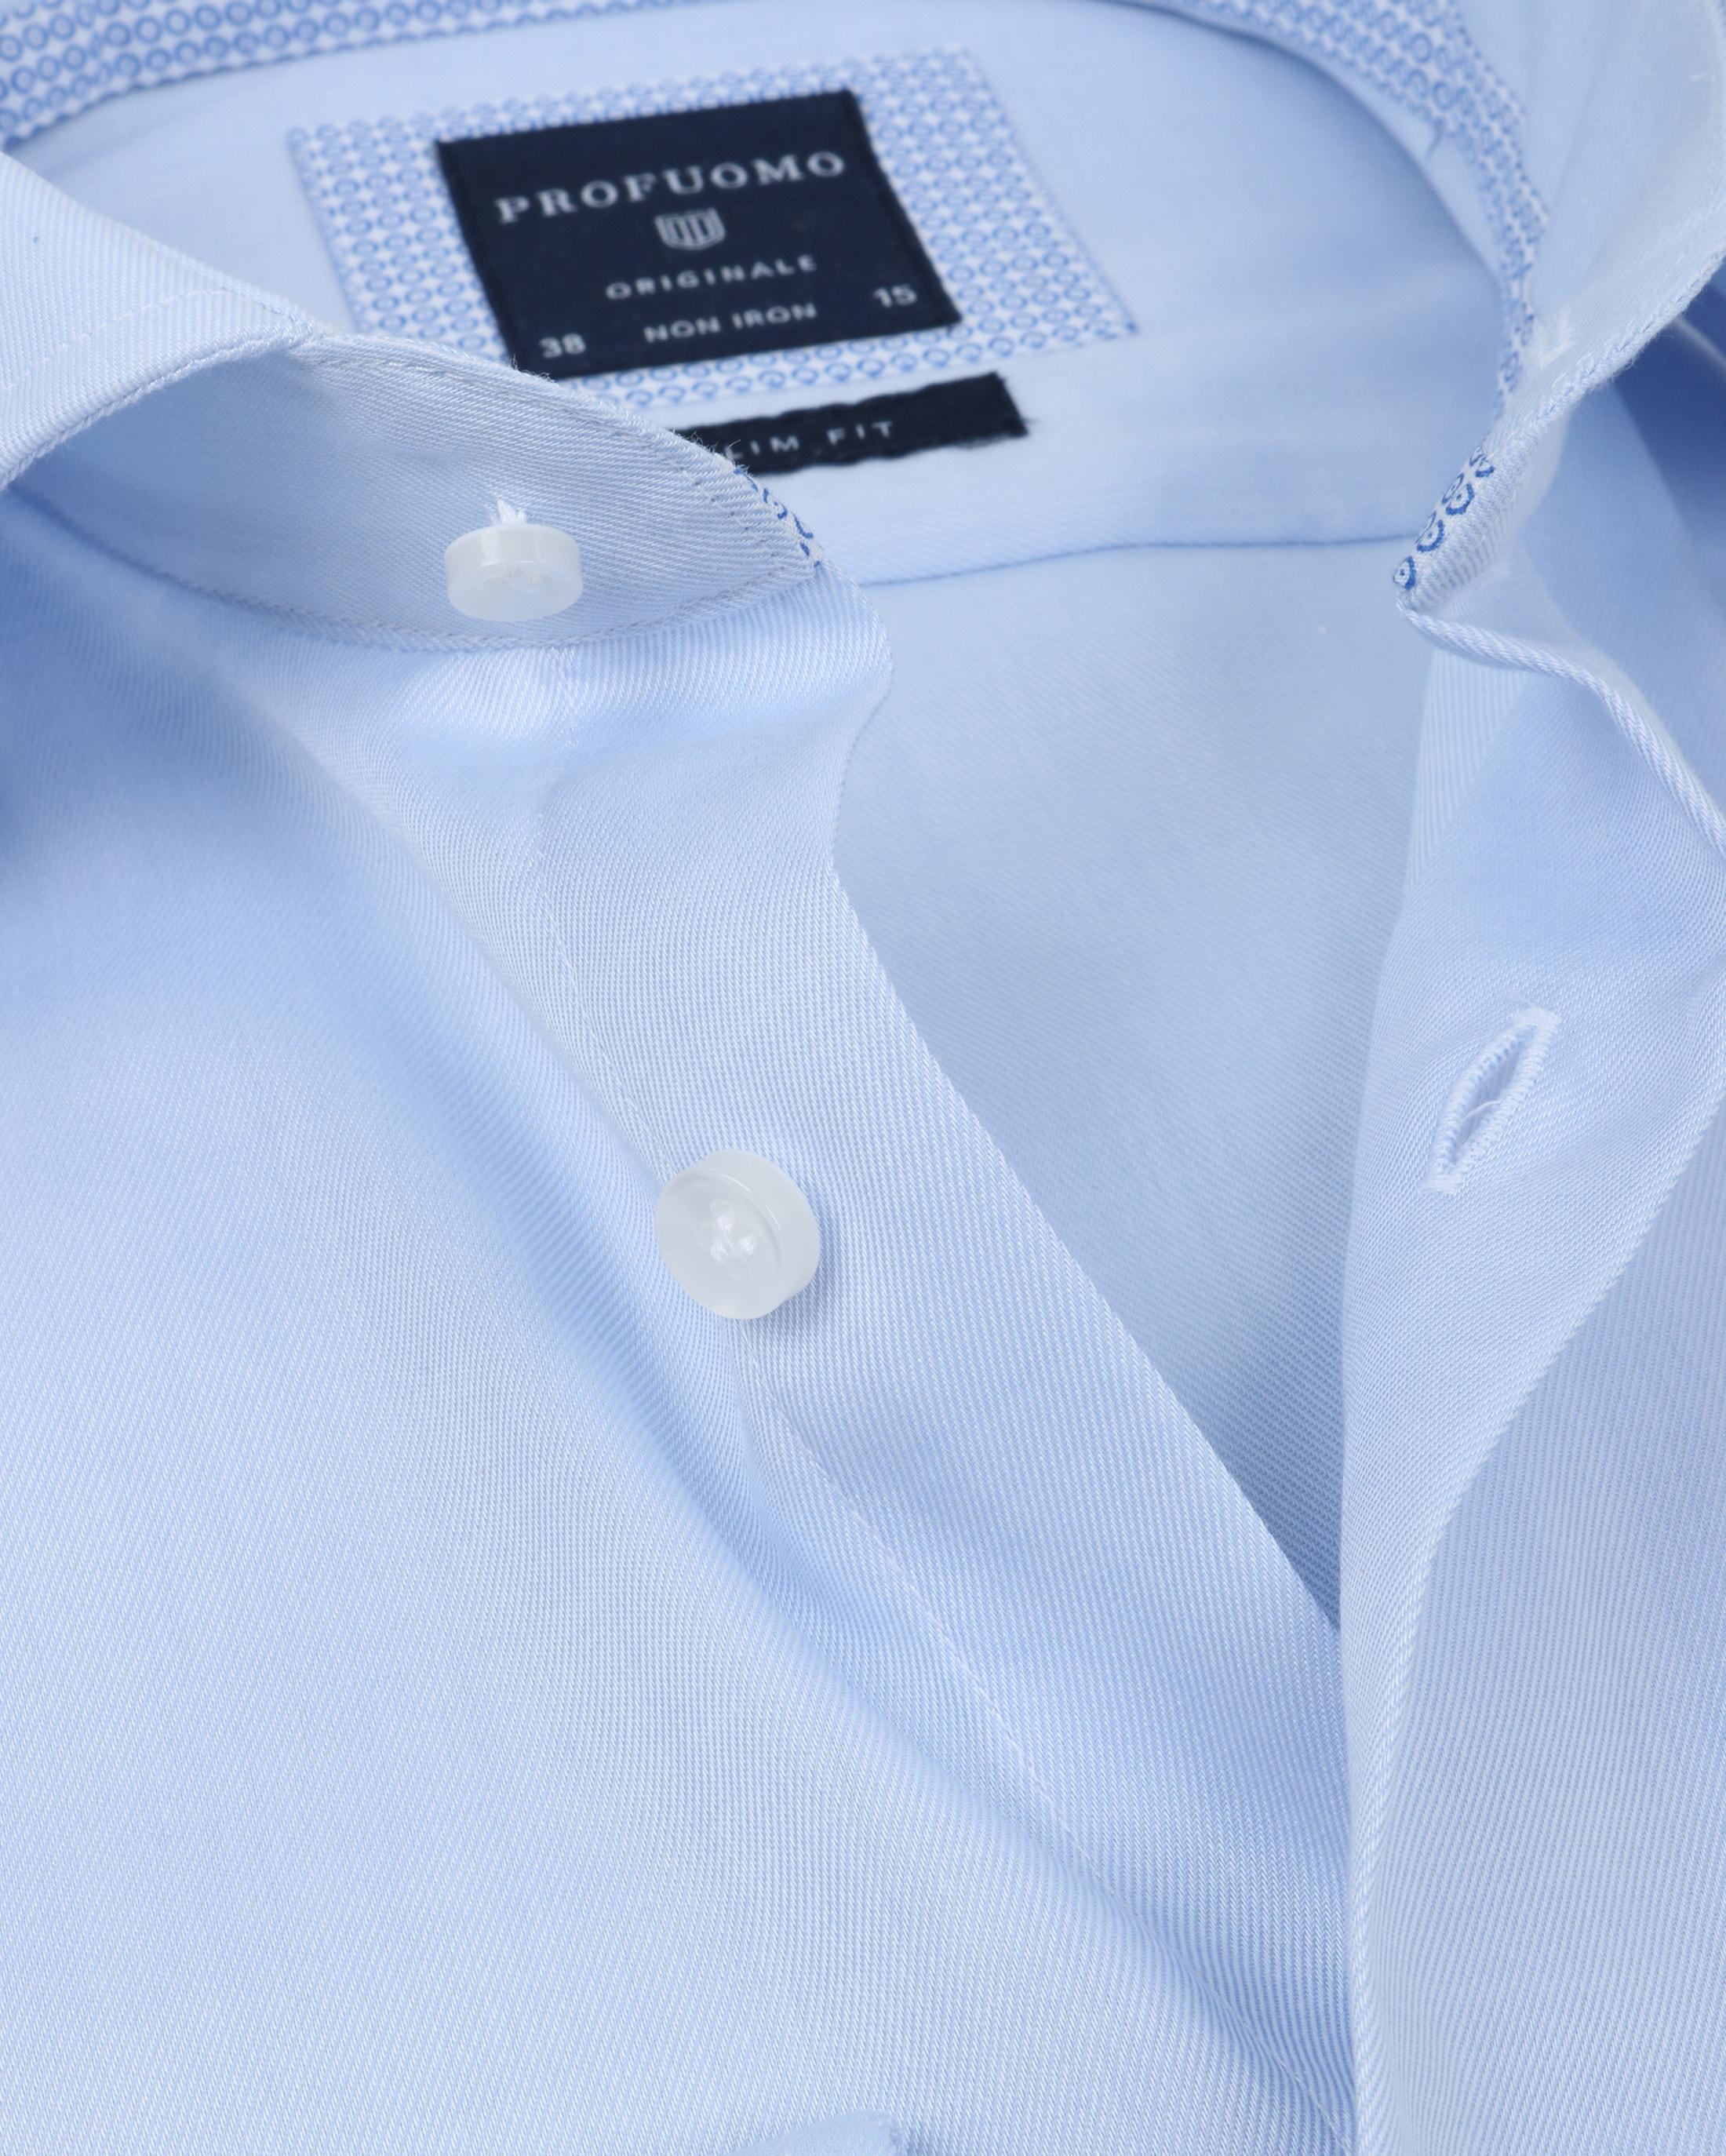 Profuomo Overhemd Lichtblauw foto 3